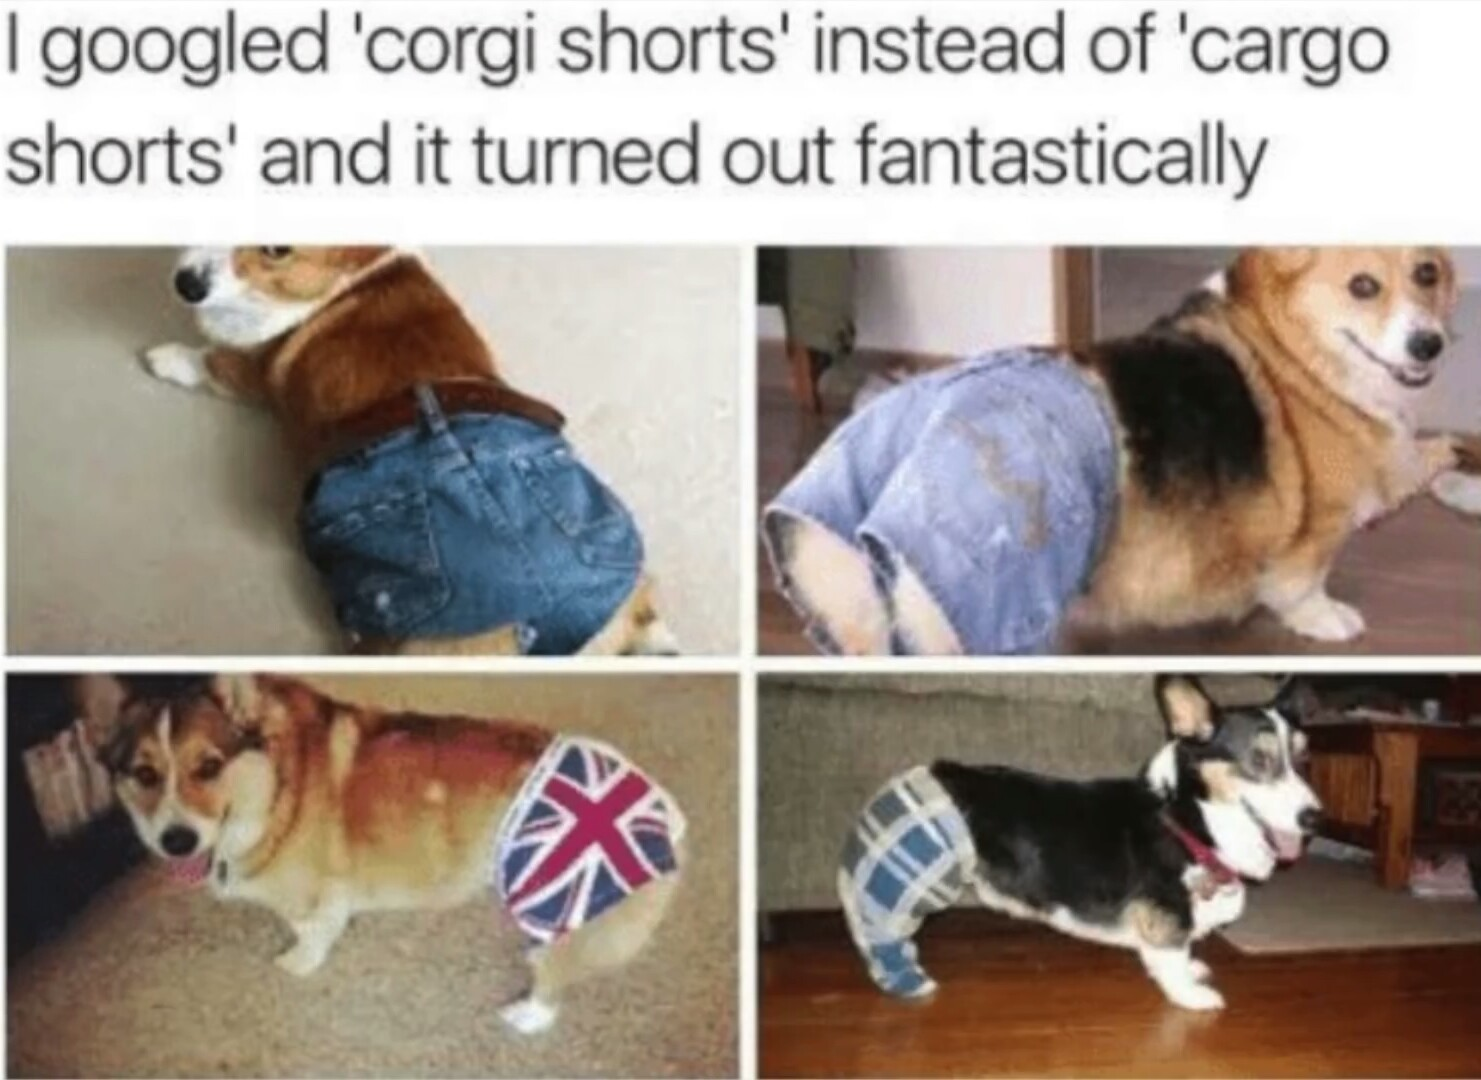 Corgo shorts - meme